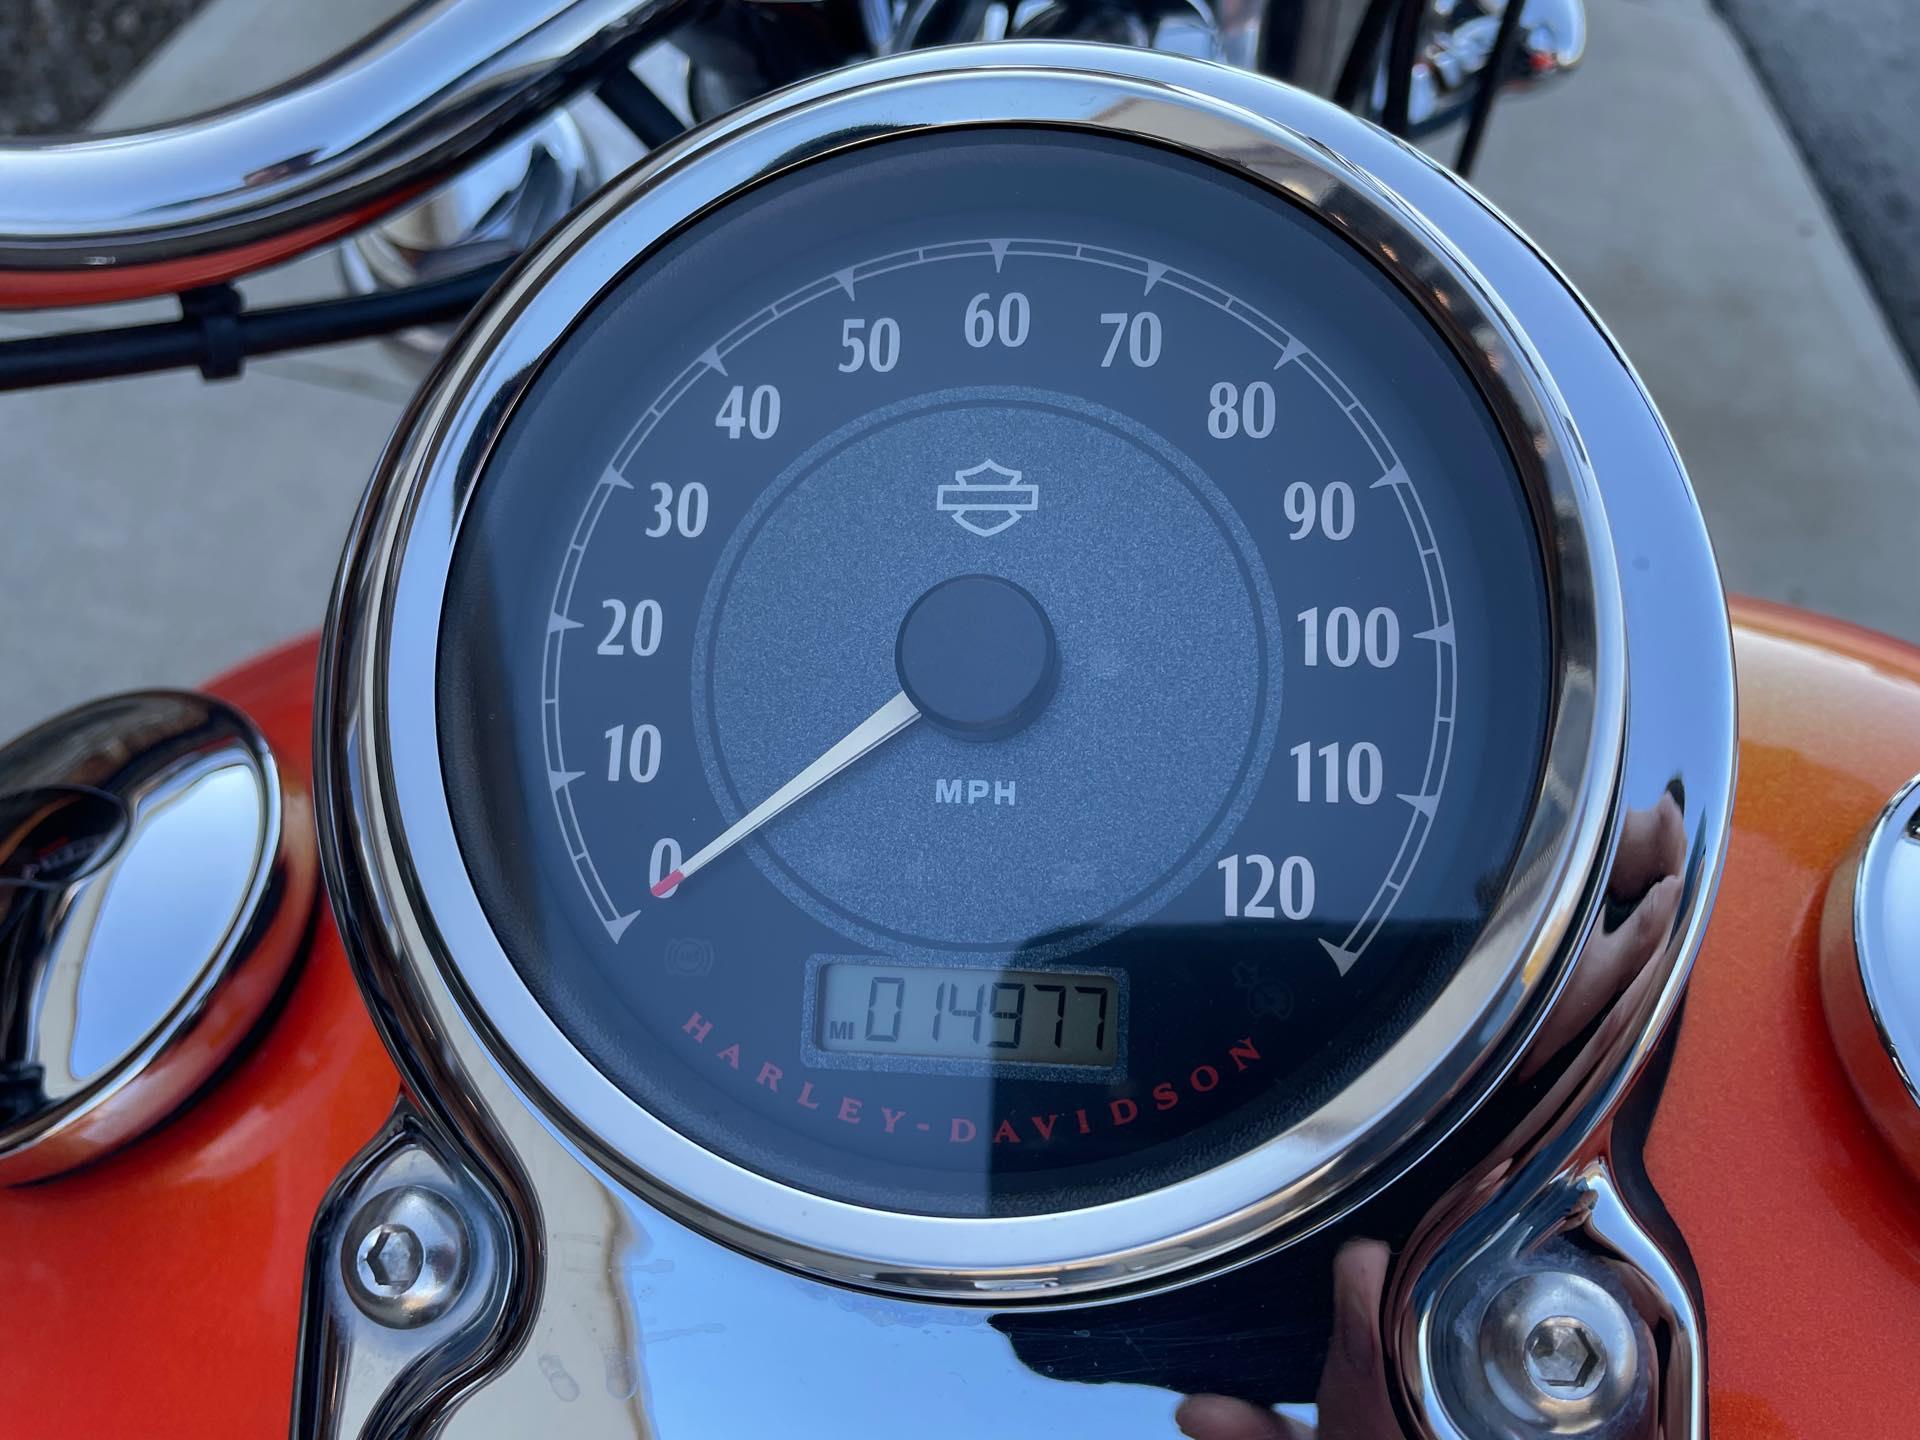 2012 Harley-Davidson Dyna Glide Super Glide Custom at Arkport Cycles